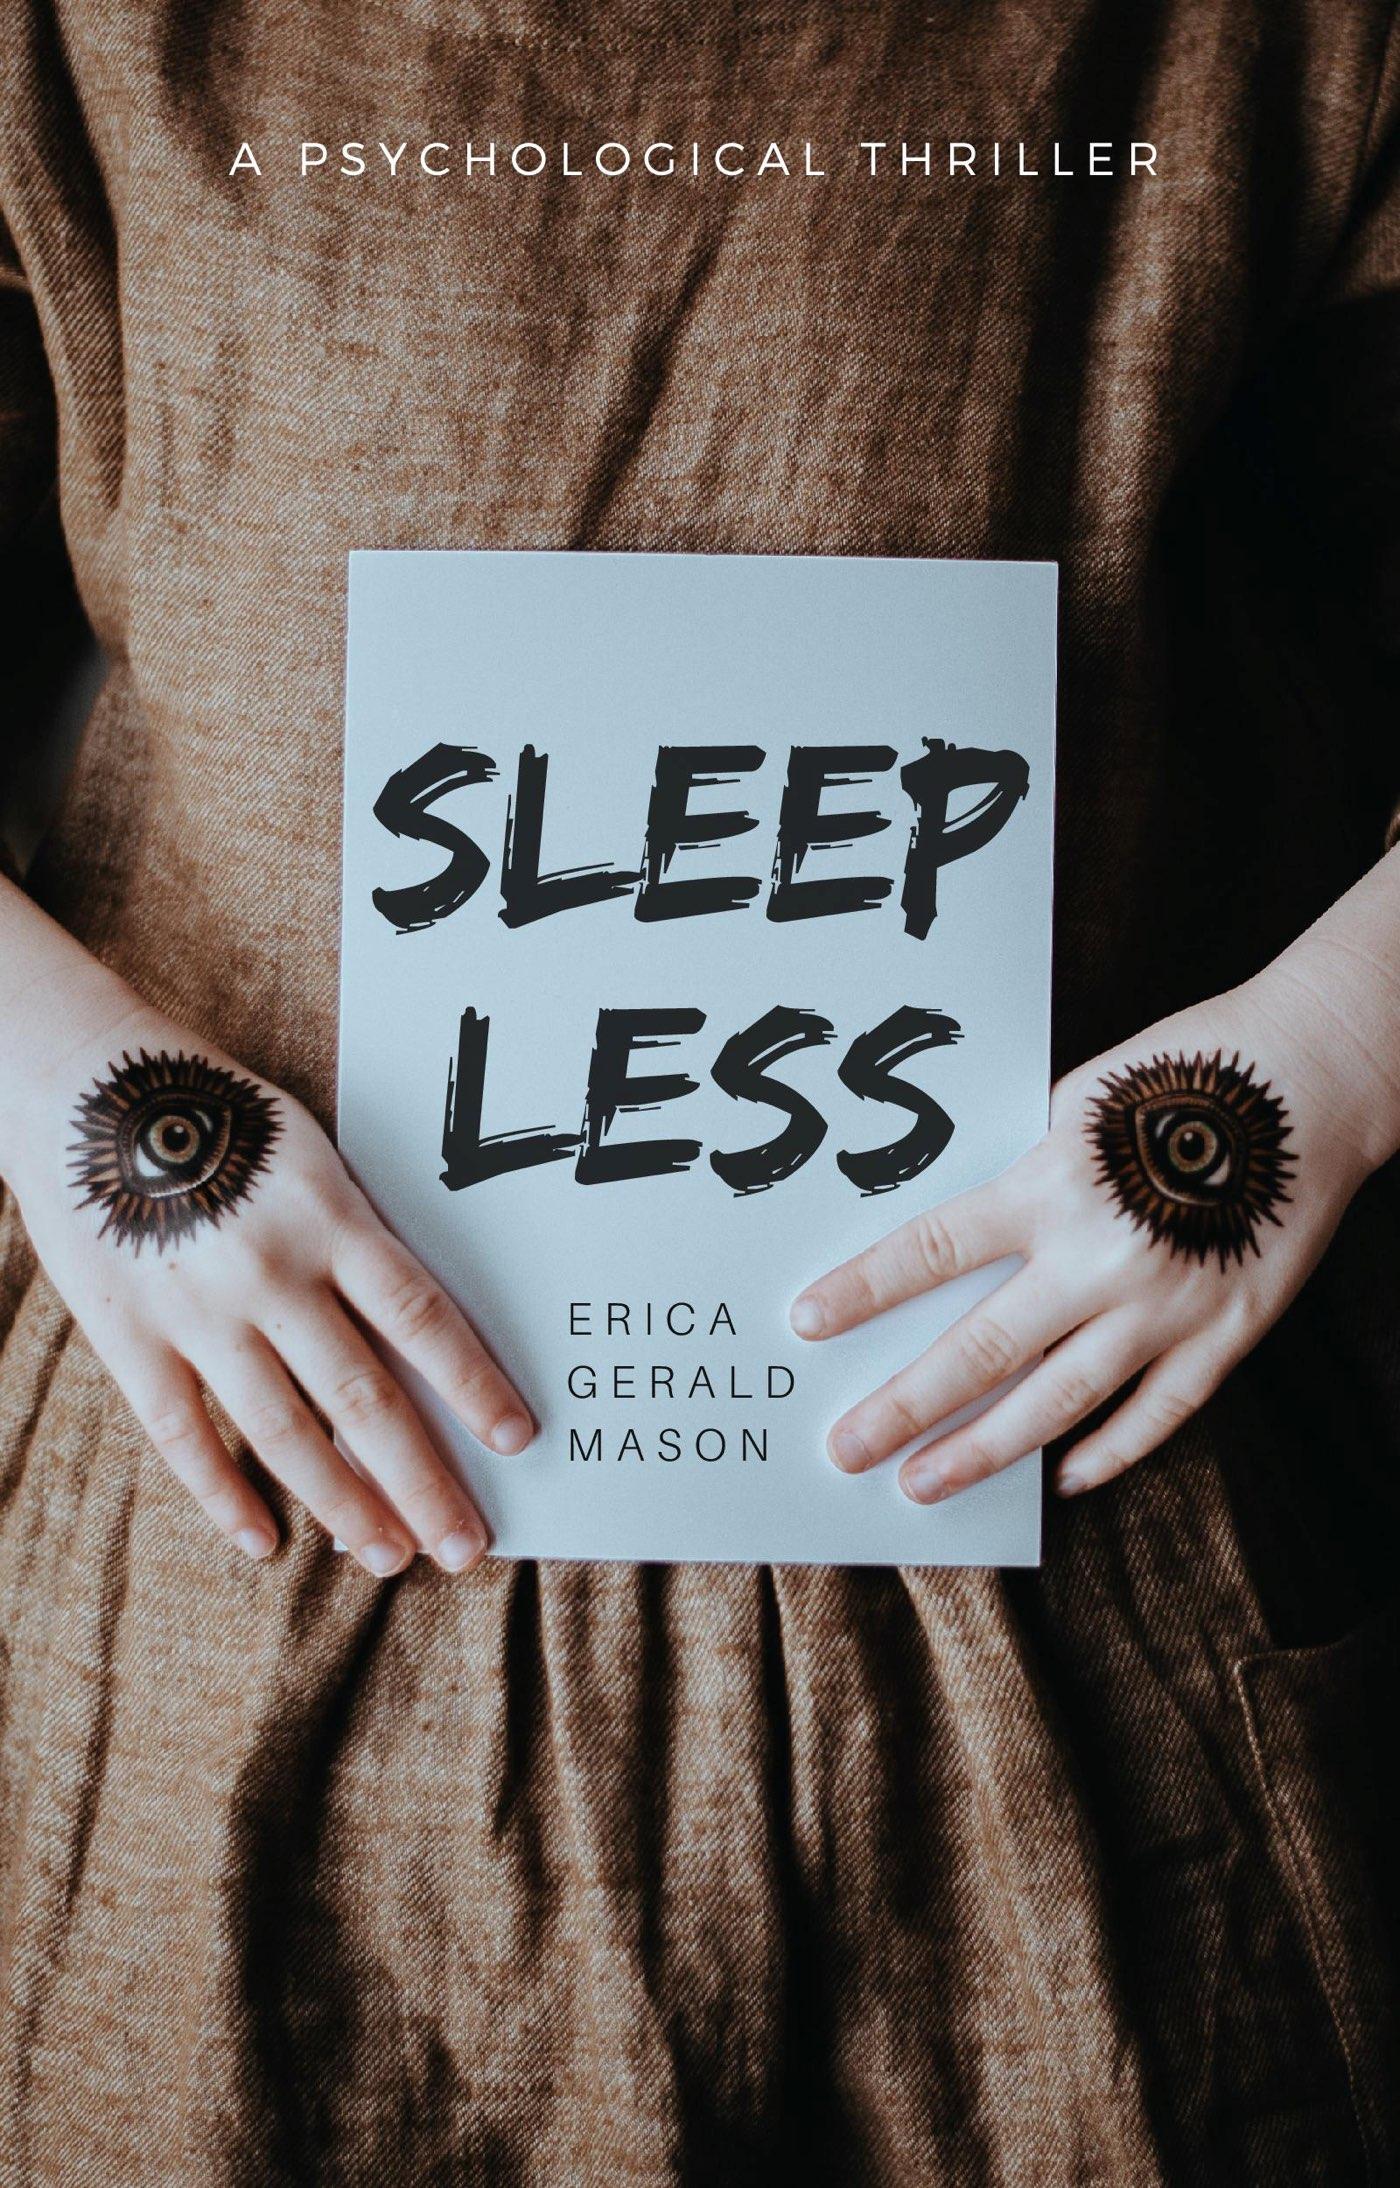 Sleepless by Erica Gerald Mason